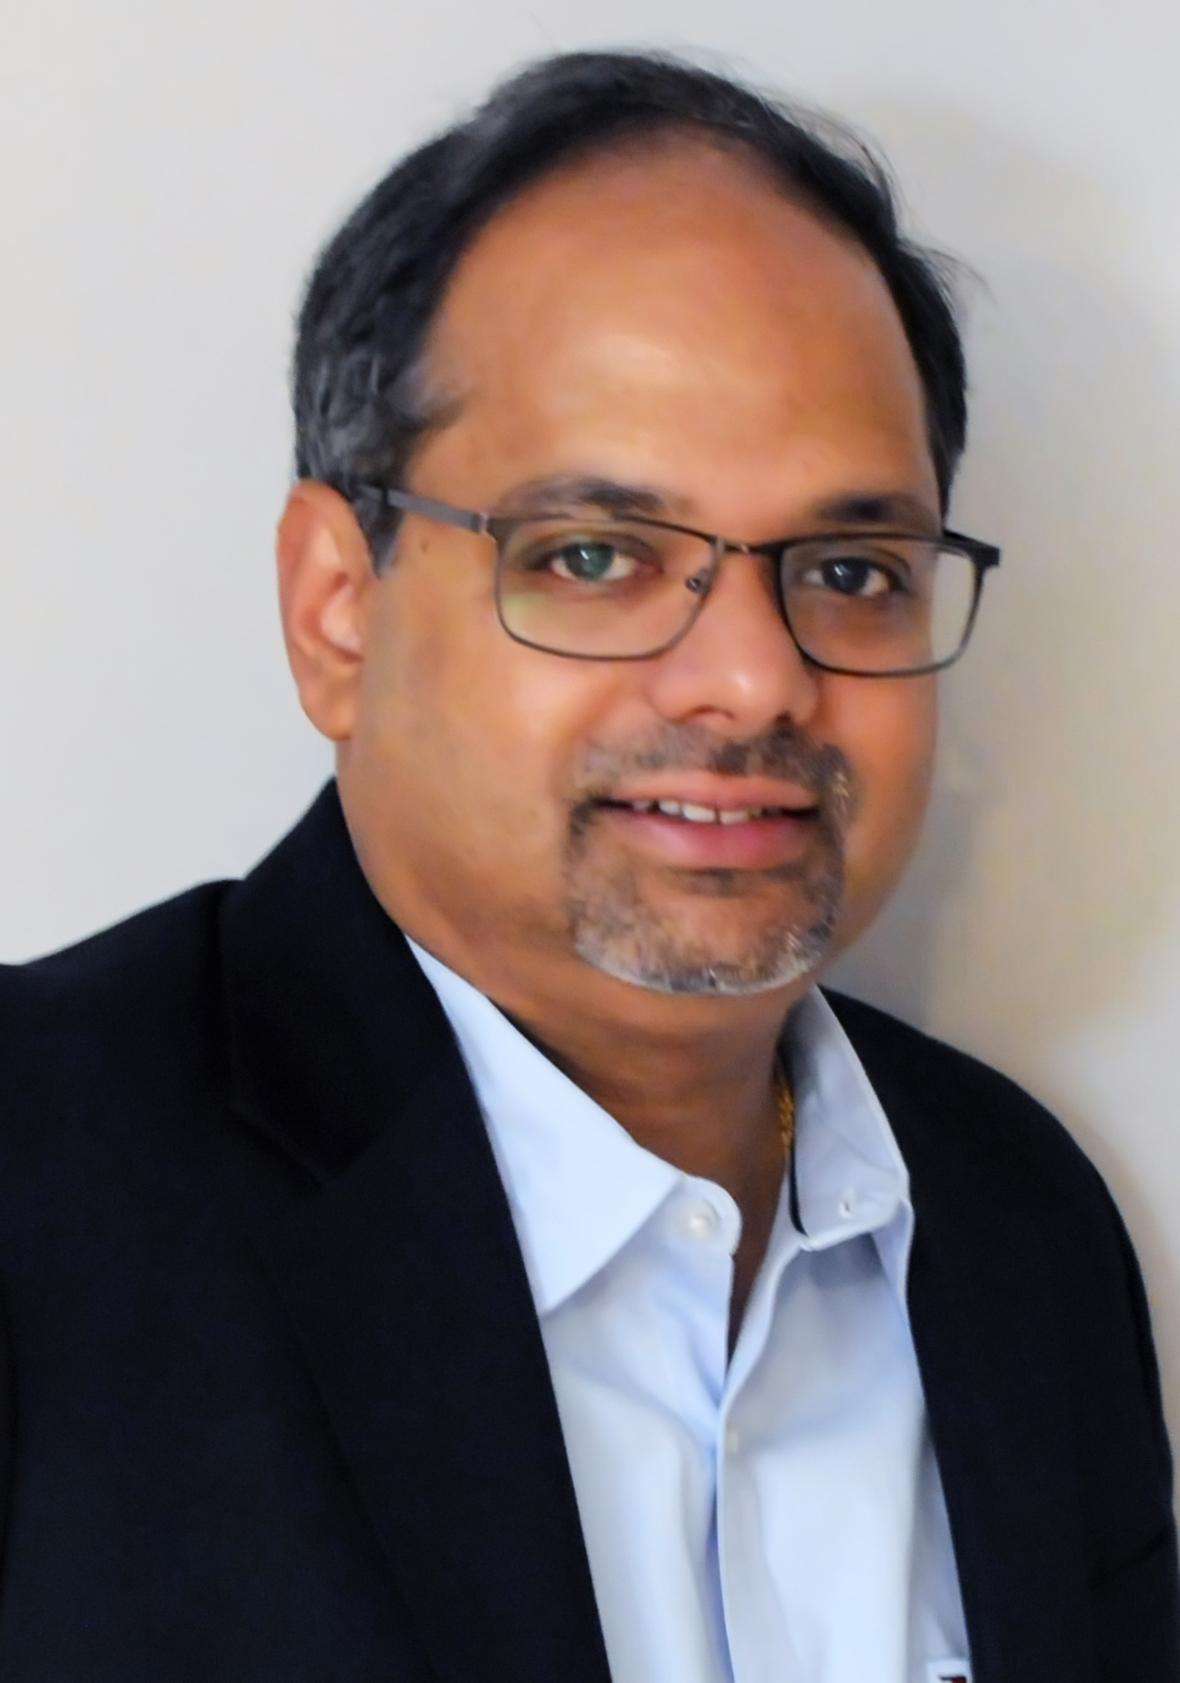 Anand Padmanabhan